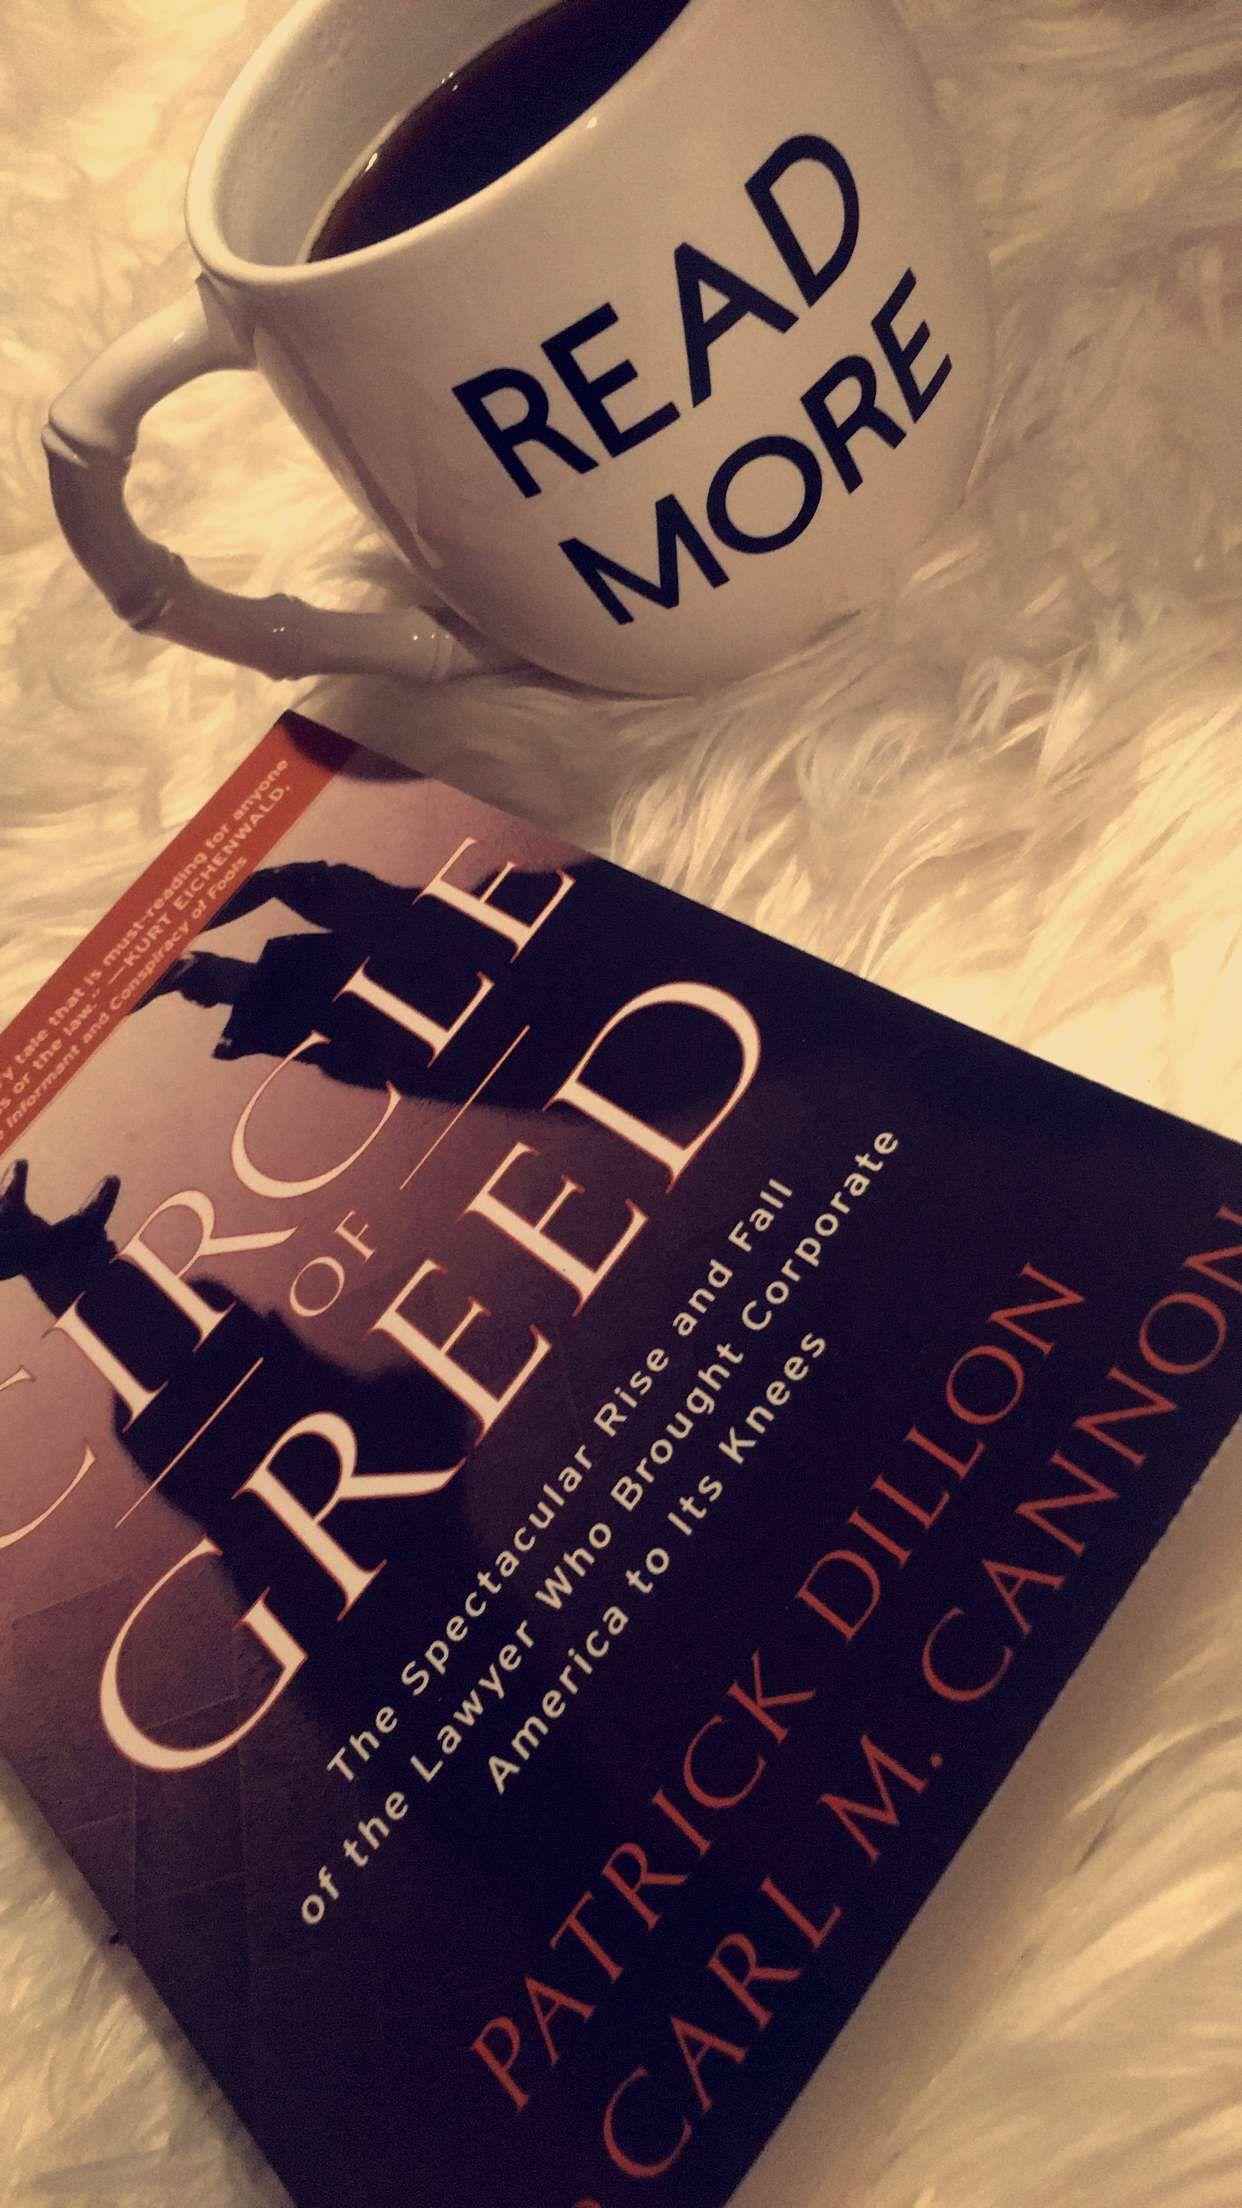 Aesthetic Lawyer Reading Books Love Readmore Law School Prep Law School Study Motivation